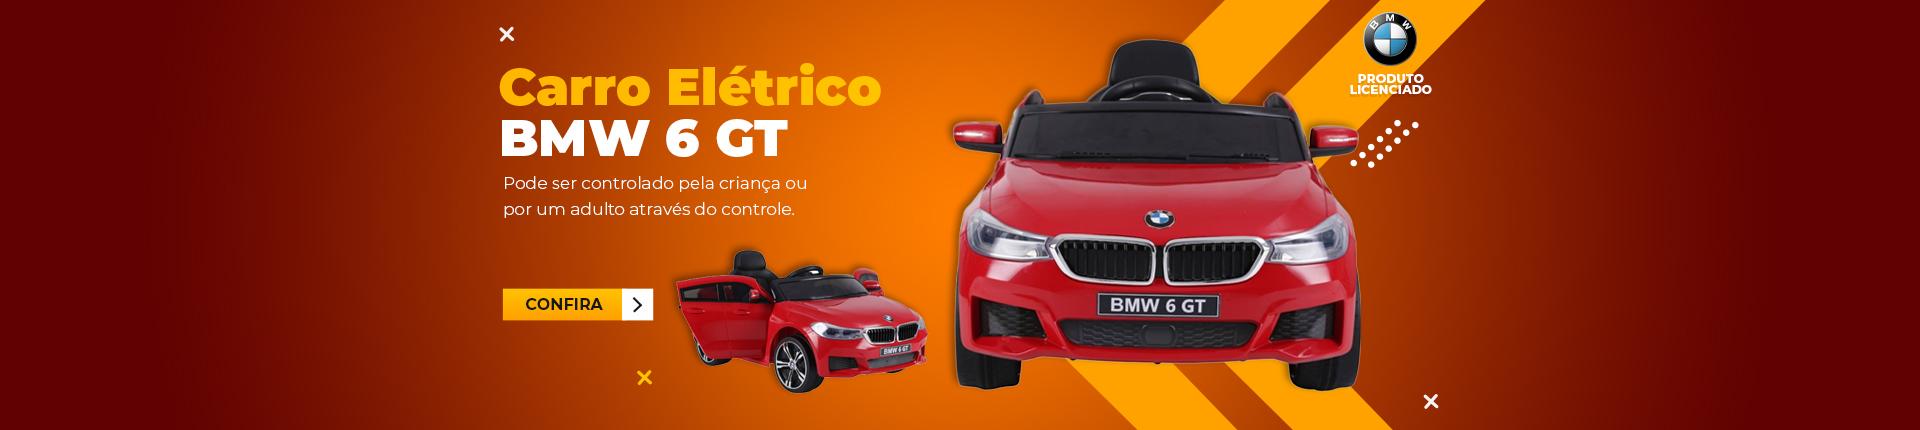 LDE - Carro elétrico BMW